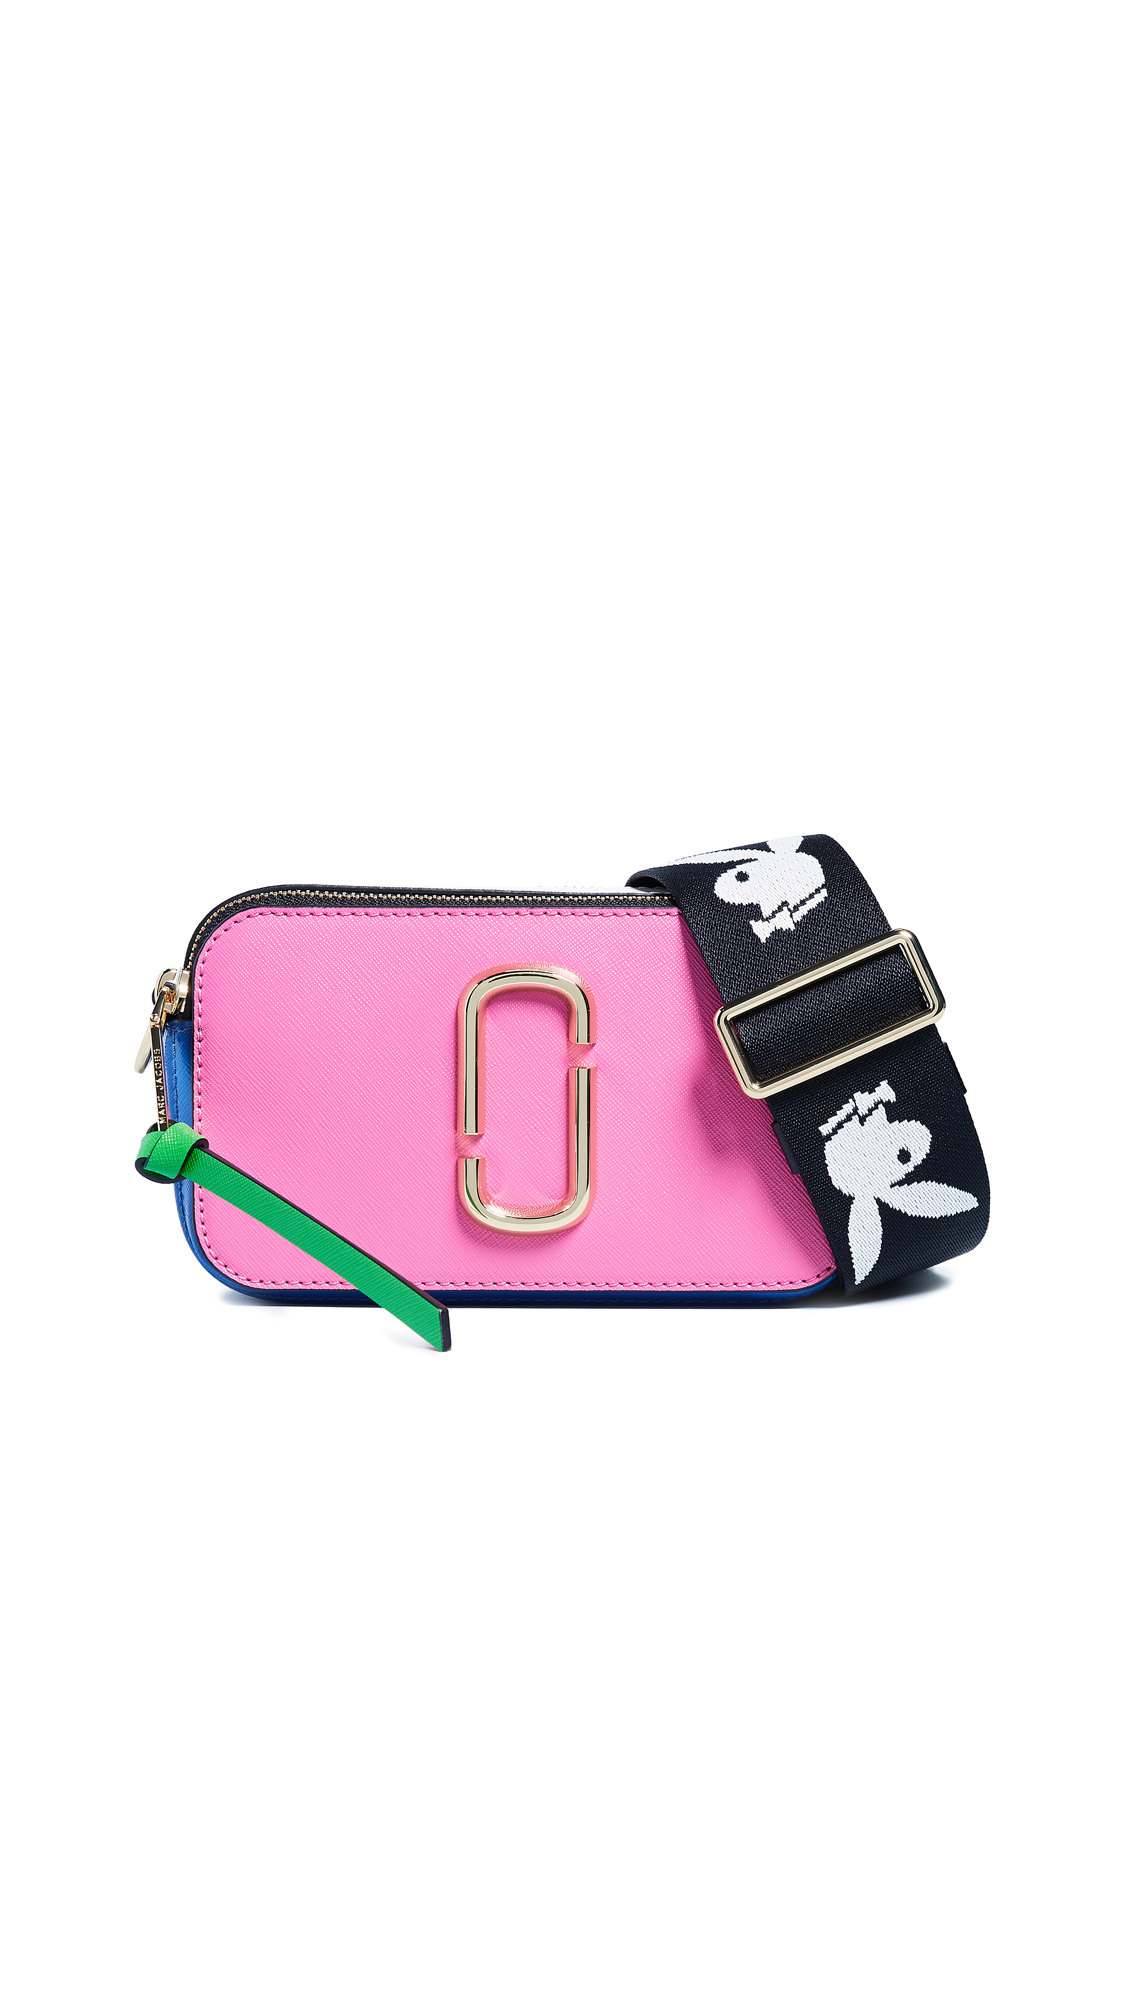 Marc Jacobs Snapshot Camera Bag - Vivid Pink